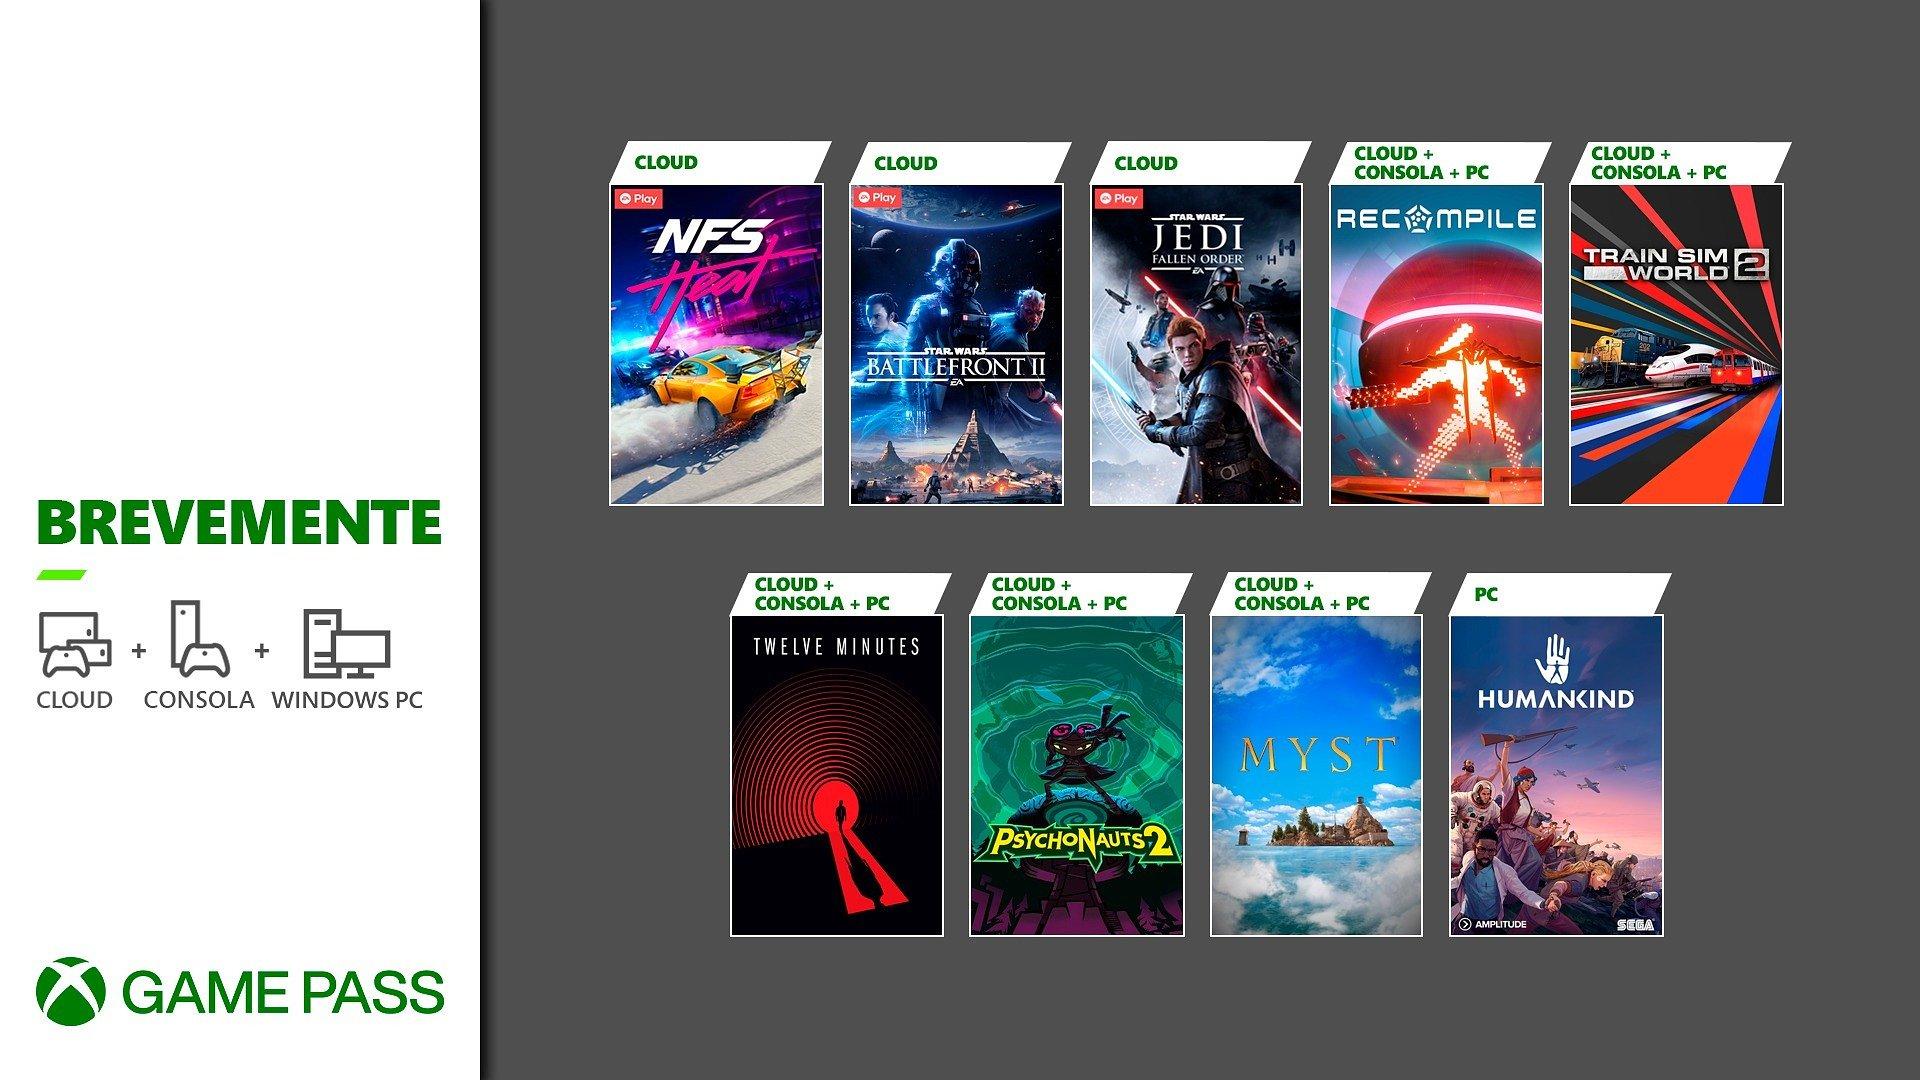 Brevemente no Xbox Game Pass